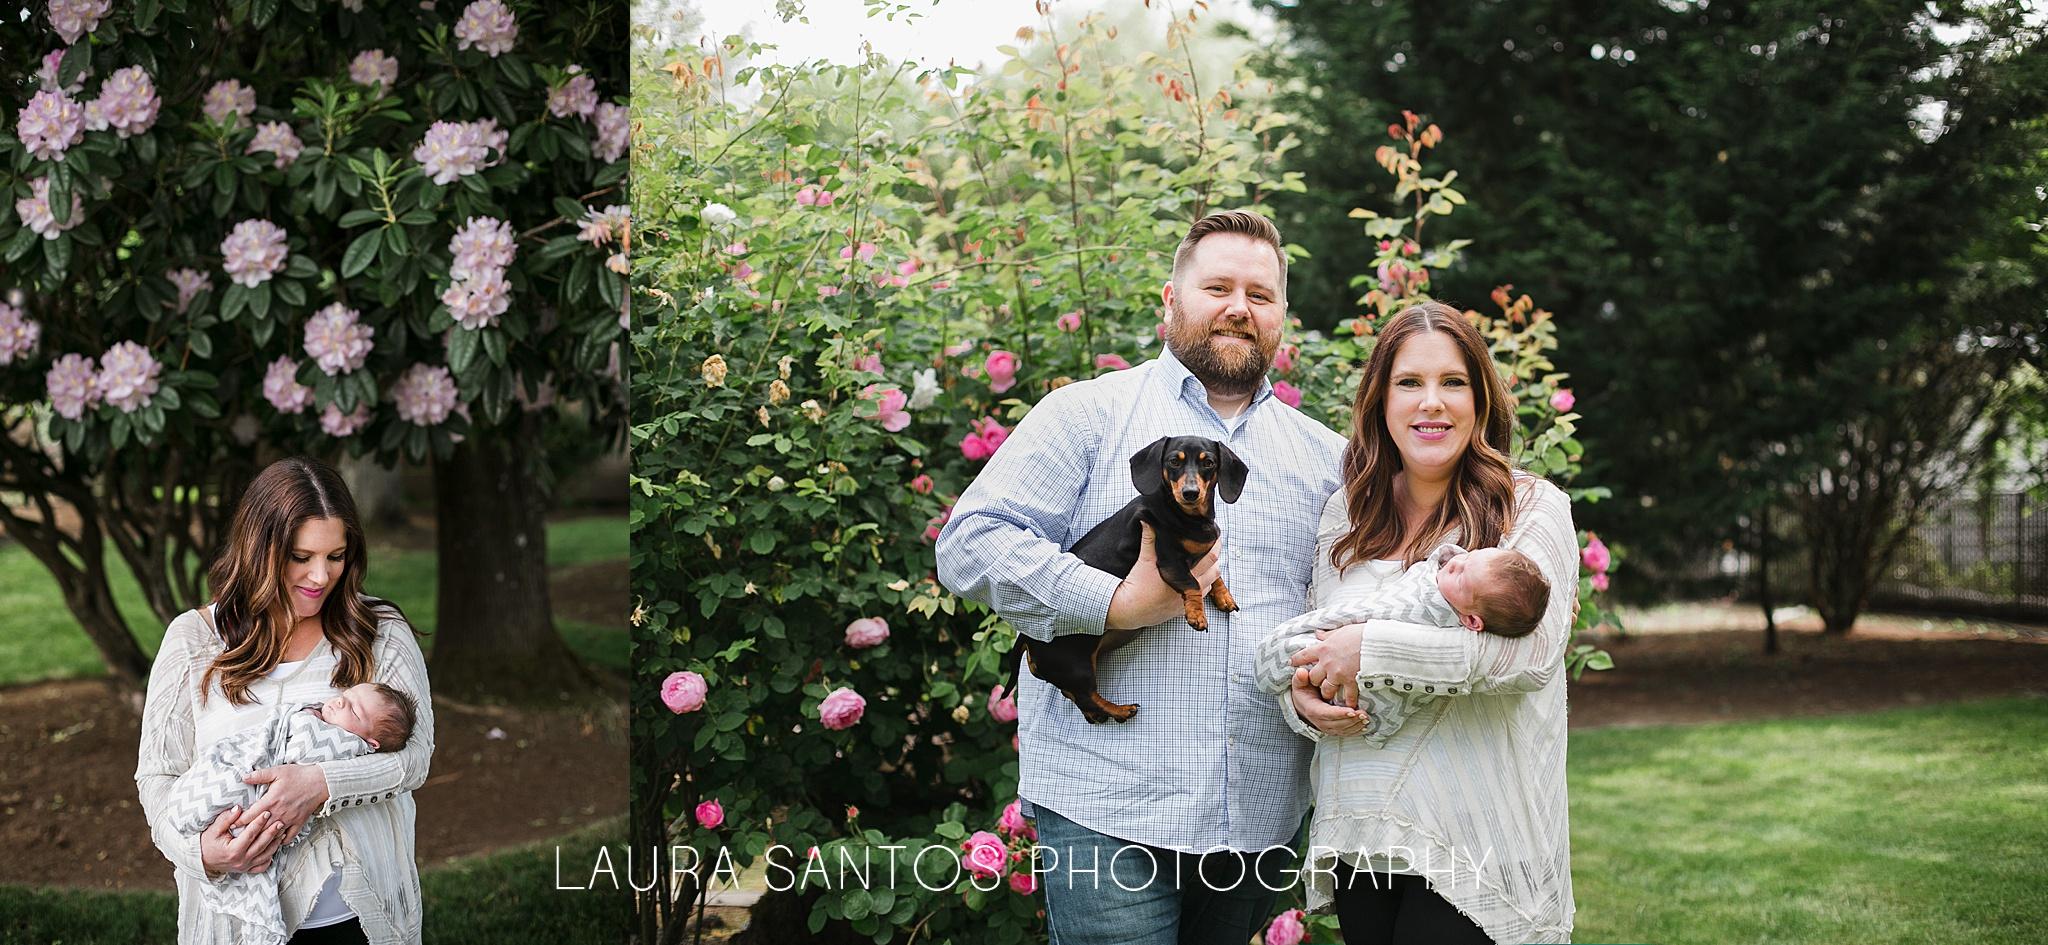 Laura Santos Photography Portland Oregon Family Photographer_0992.jpg